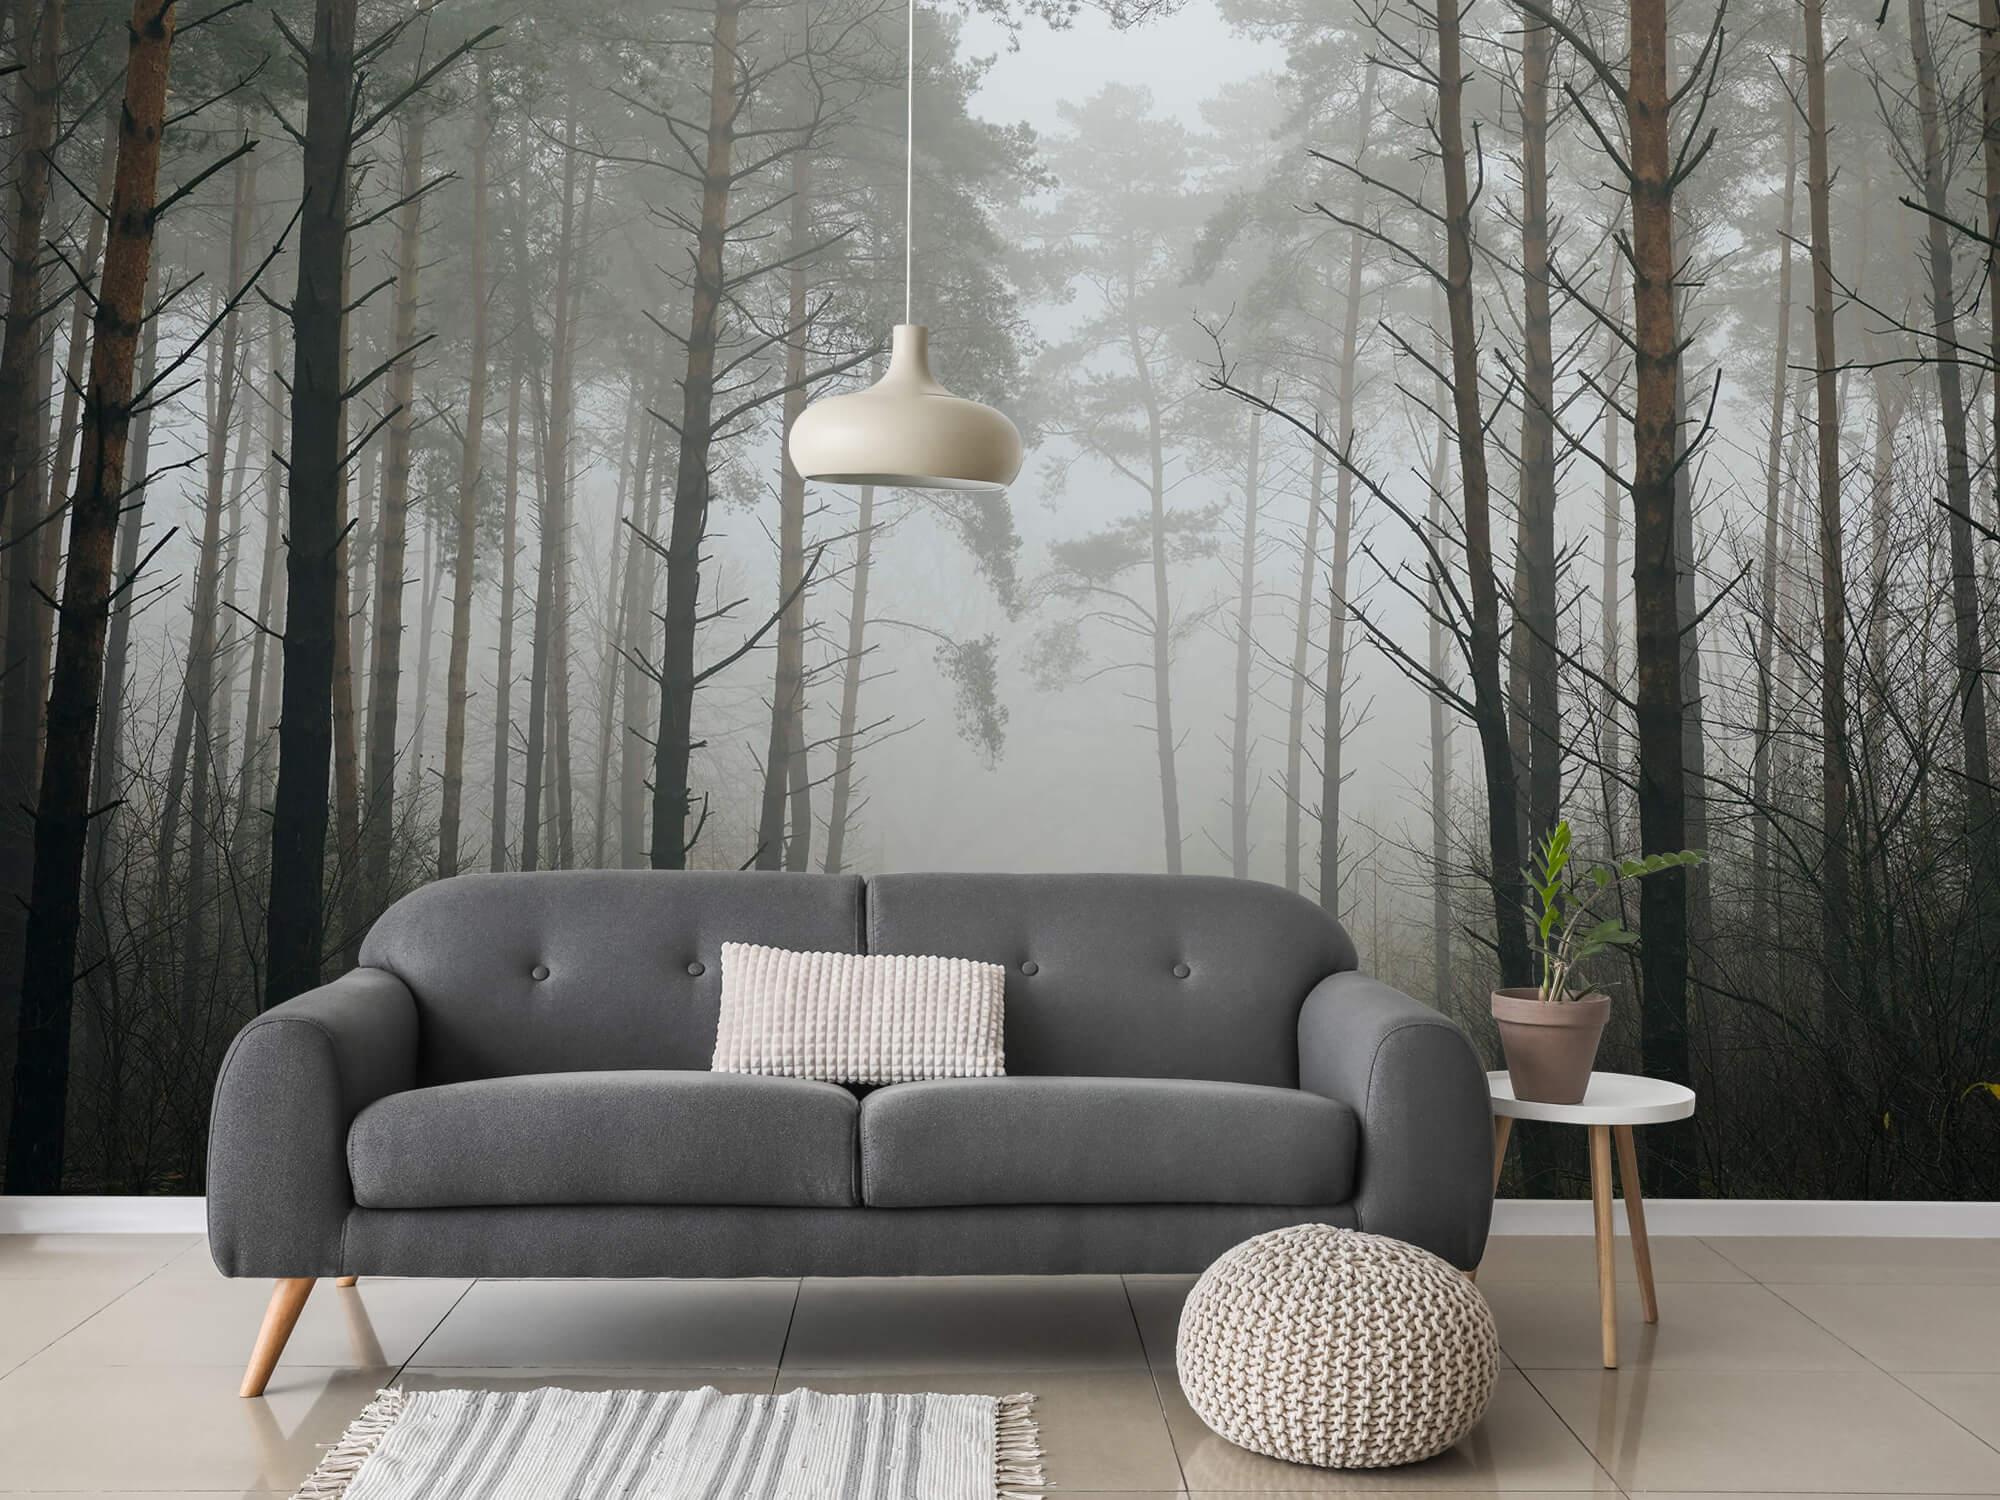 Natuur Pad in mistig bos 2